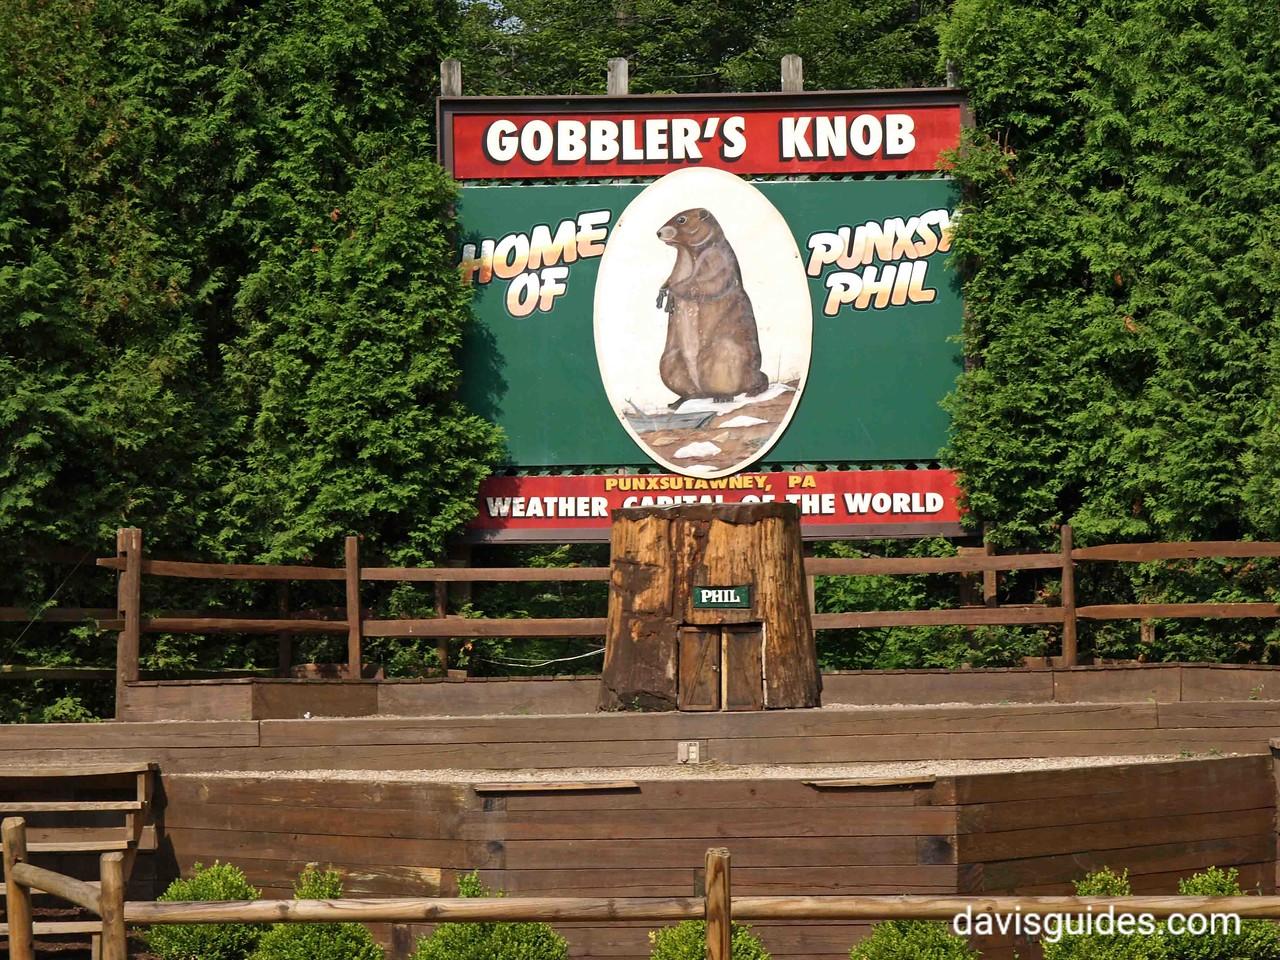 Gobbler's Knob above Punxatawney, PA